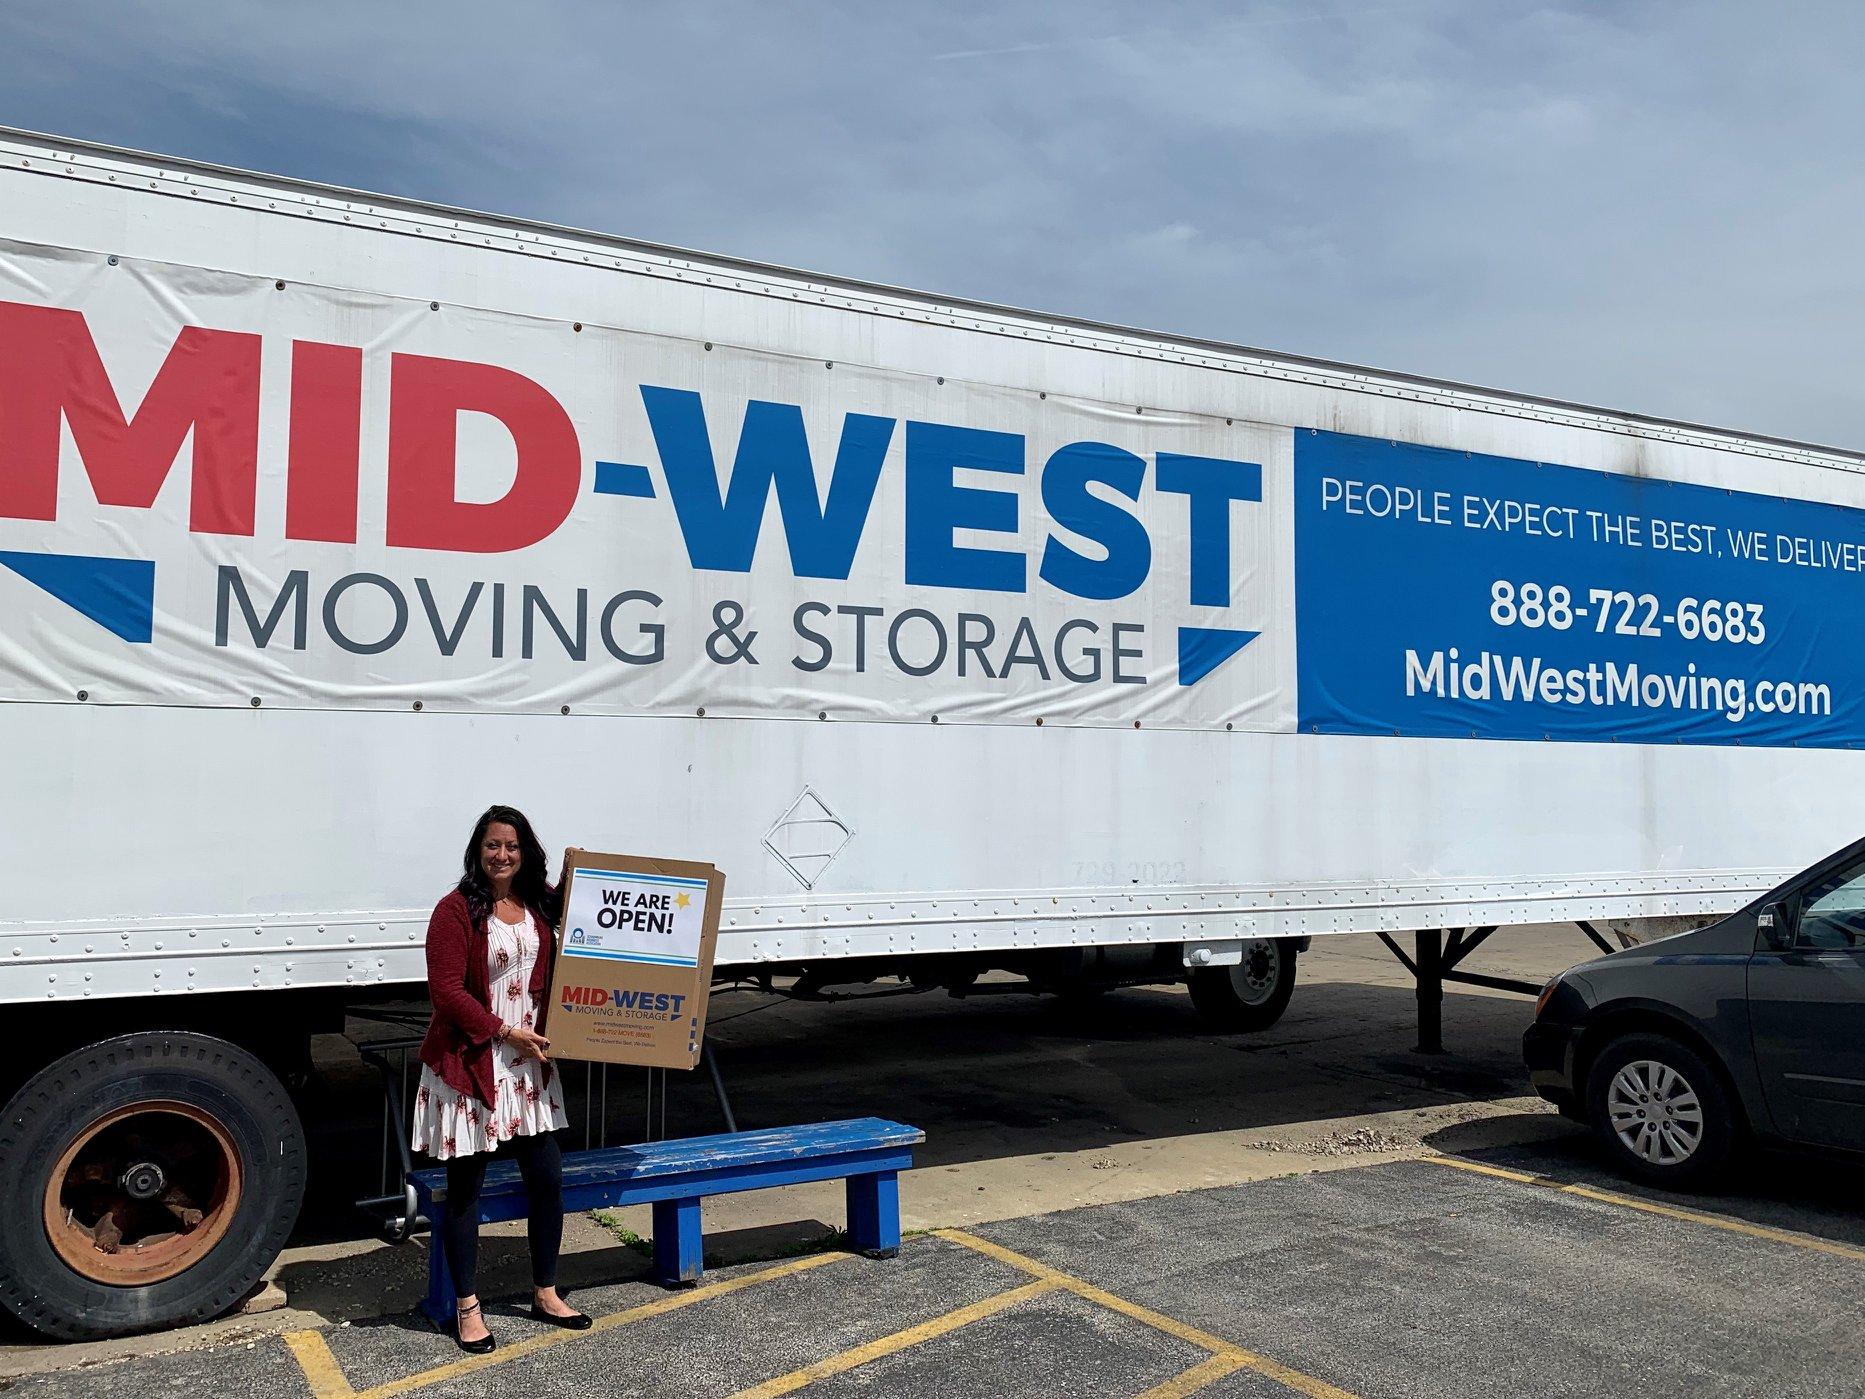 Mid-West Moving & Storage Truck Kari-Ann Ryan